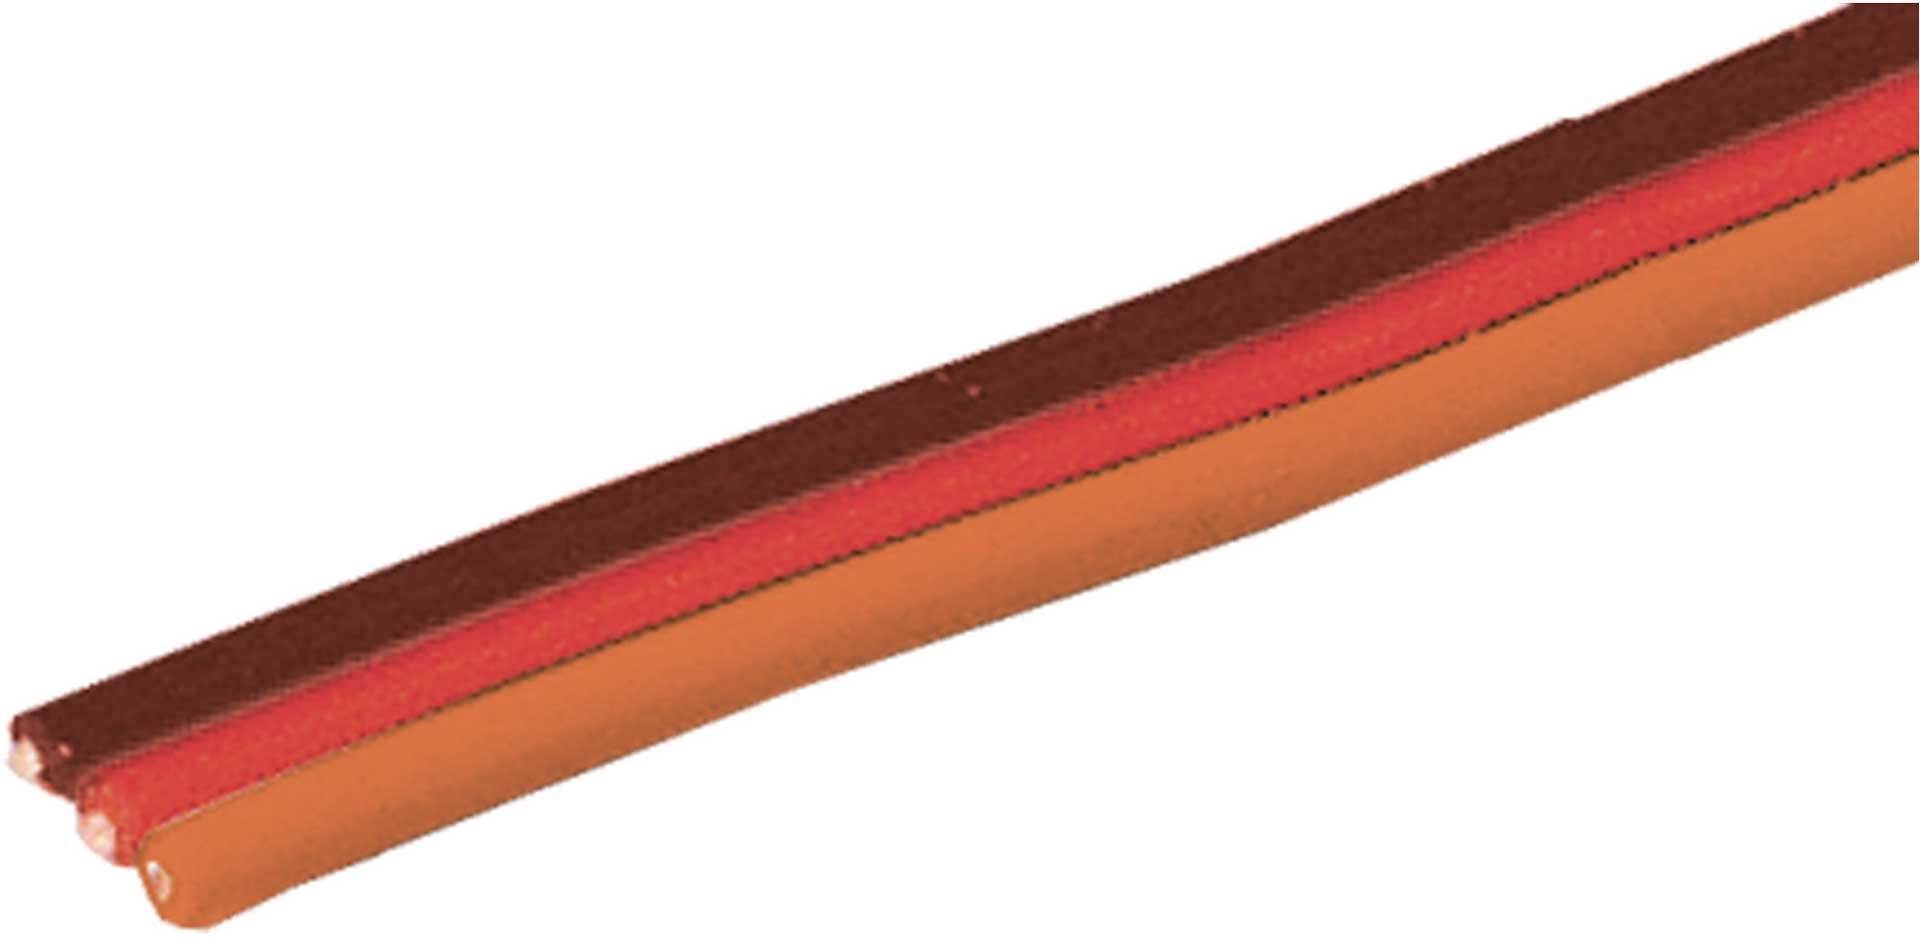 Robbe Modellsport Servokabel Graupner/JR/Uni 5 Meter flach 0,13mm² (26AWG) PVC Meterware